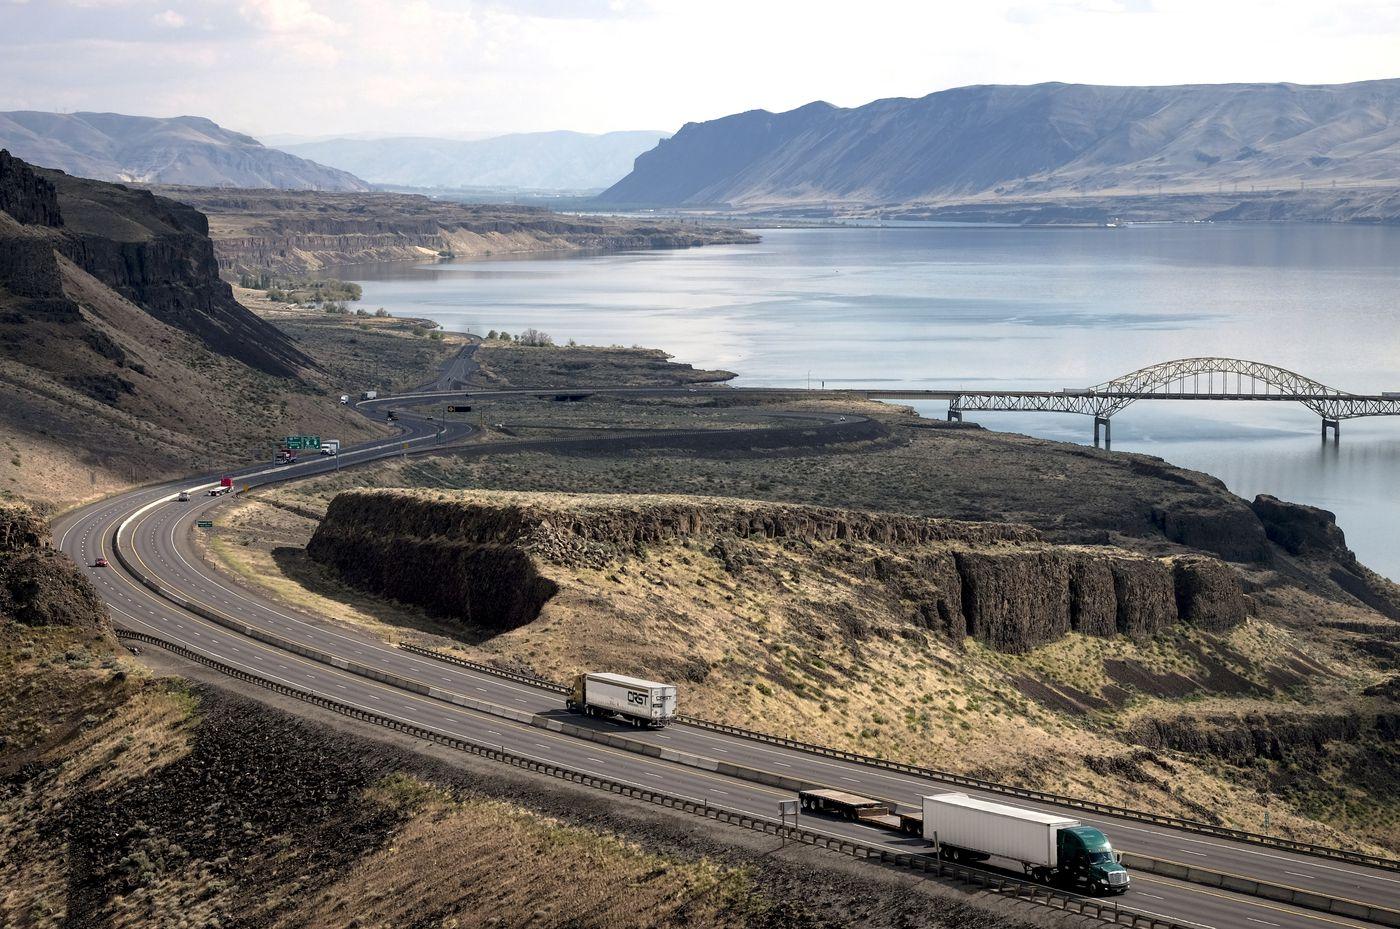 Interstate 90 runs along the Columbia River near Vantage, Wash. Washington Post photo by Bonnie Jo Mount